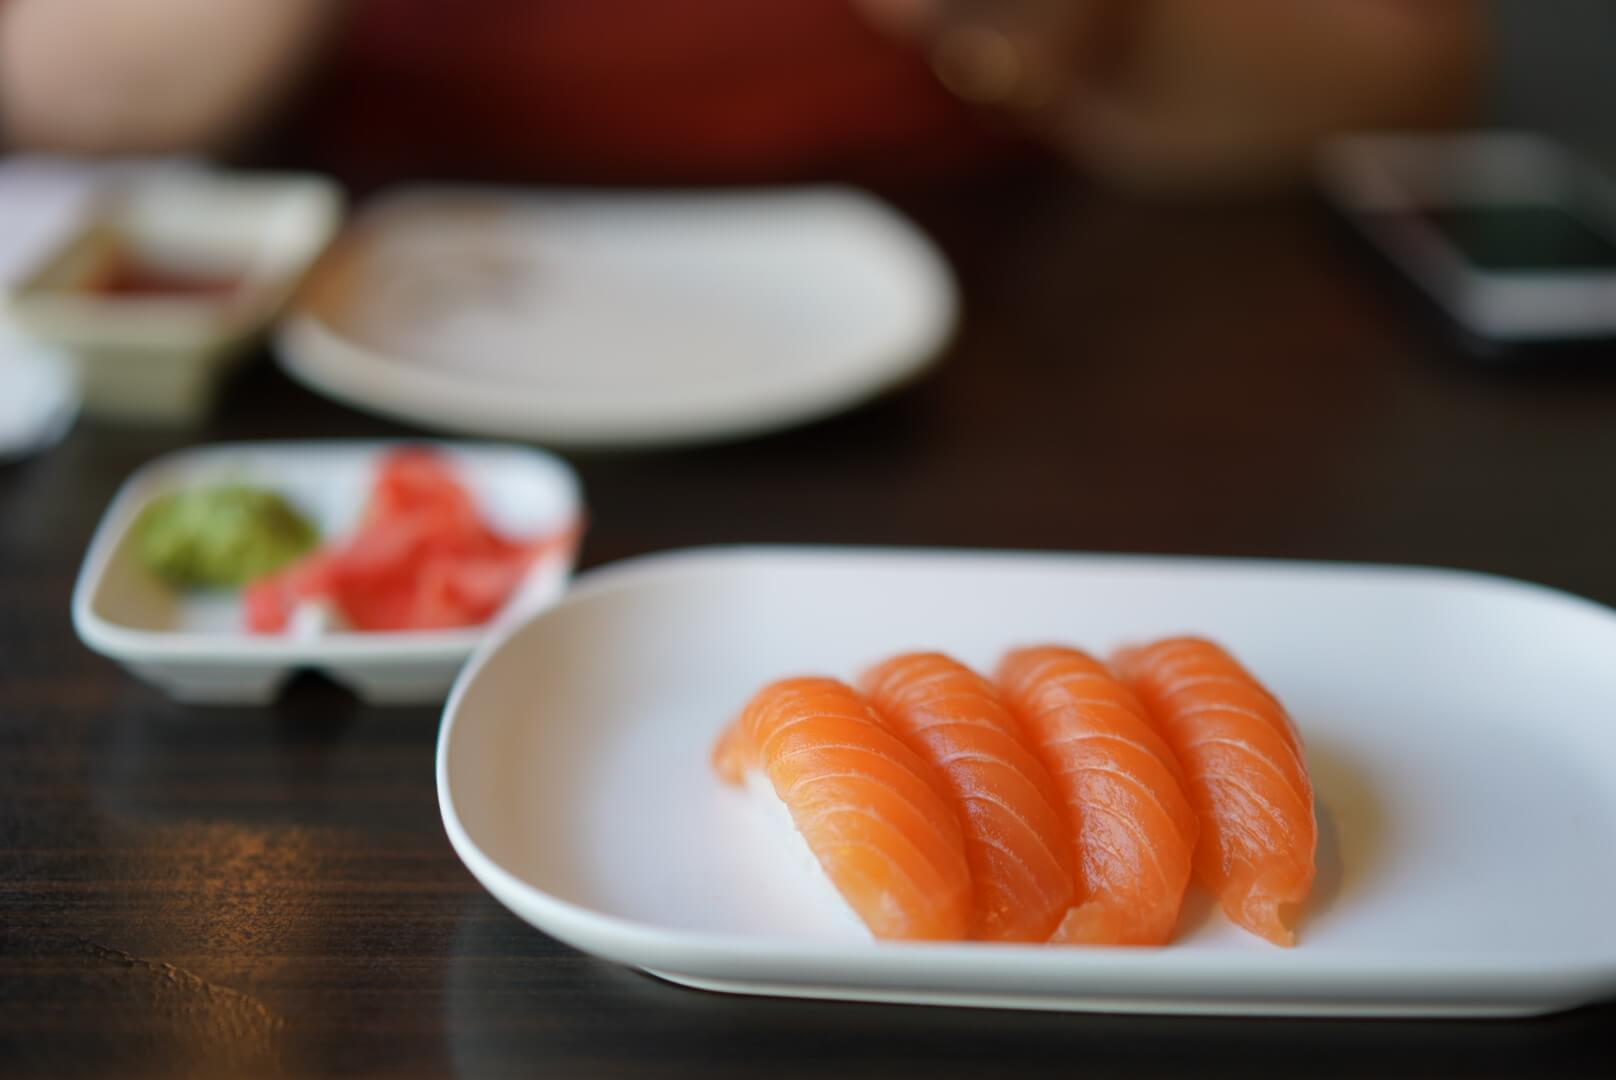 kyoto house sushiのサーモン寿司